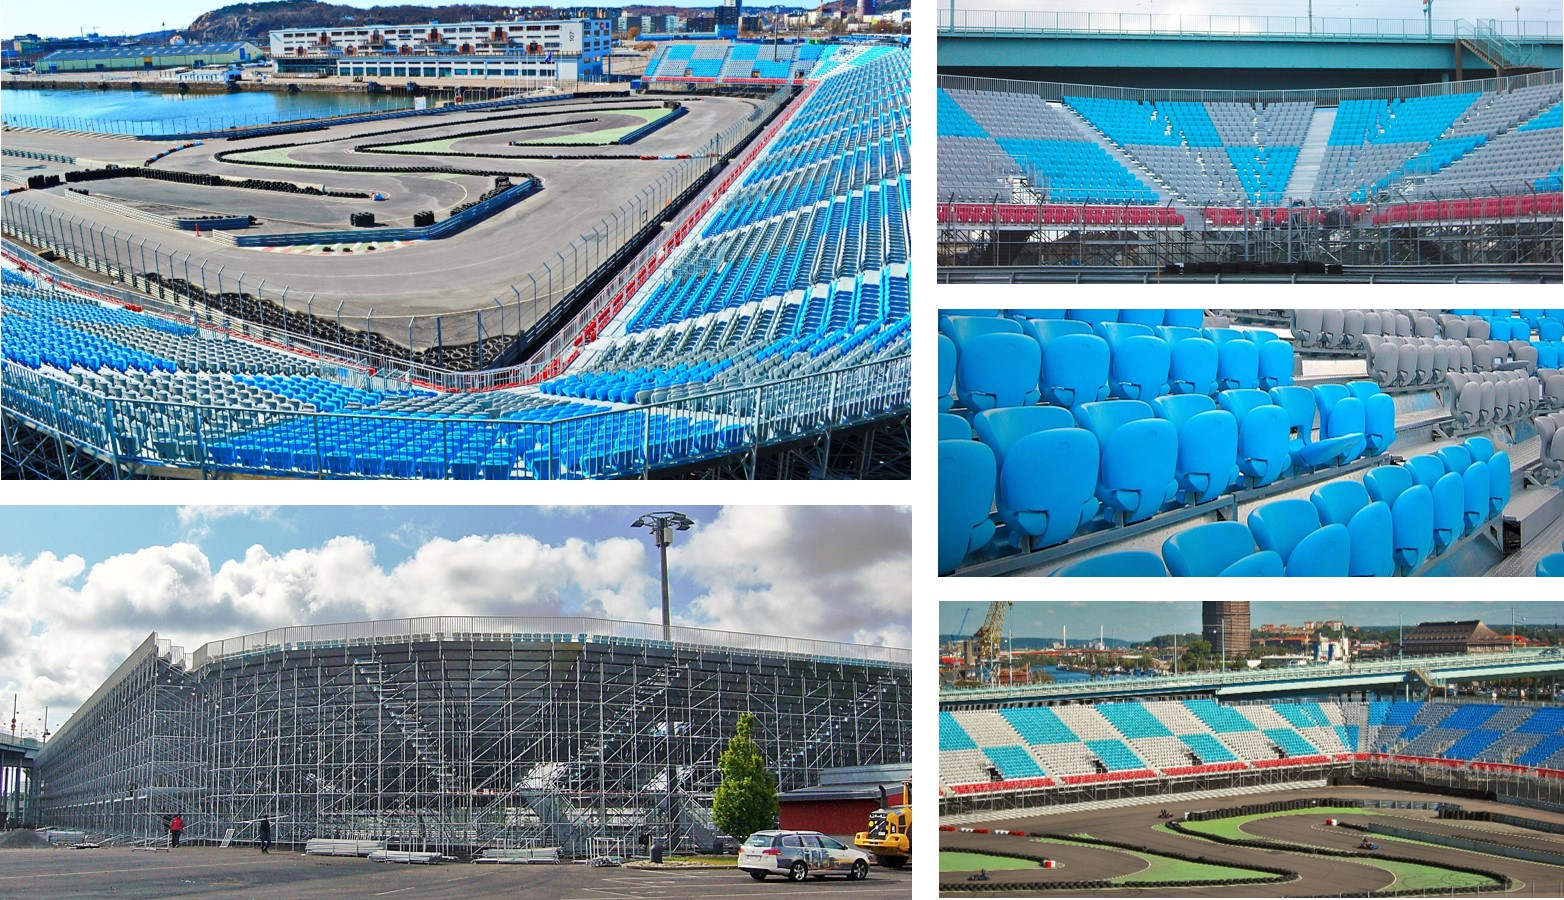 Volvo-Polestar Circuit in Gothenburg (Sweden)2012 10,700 Tip-Up seats PS-08 of Pakar Grandstand tribune bleacher